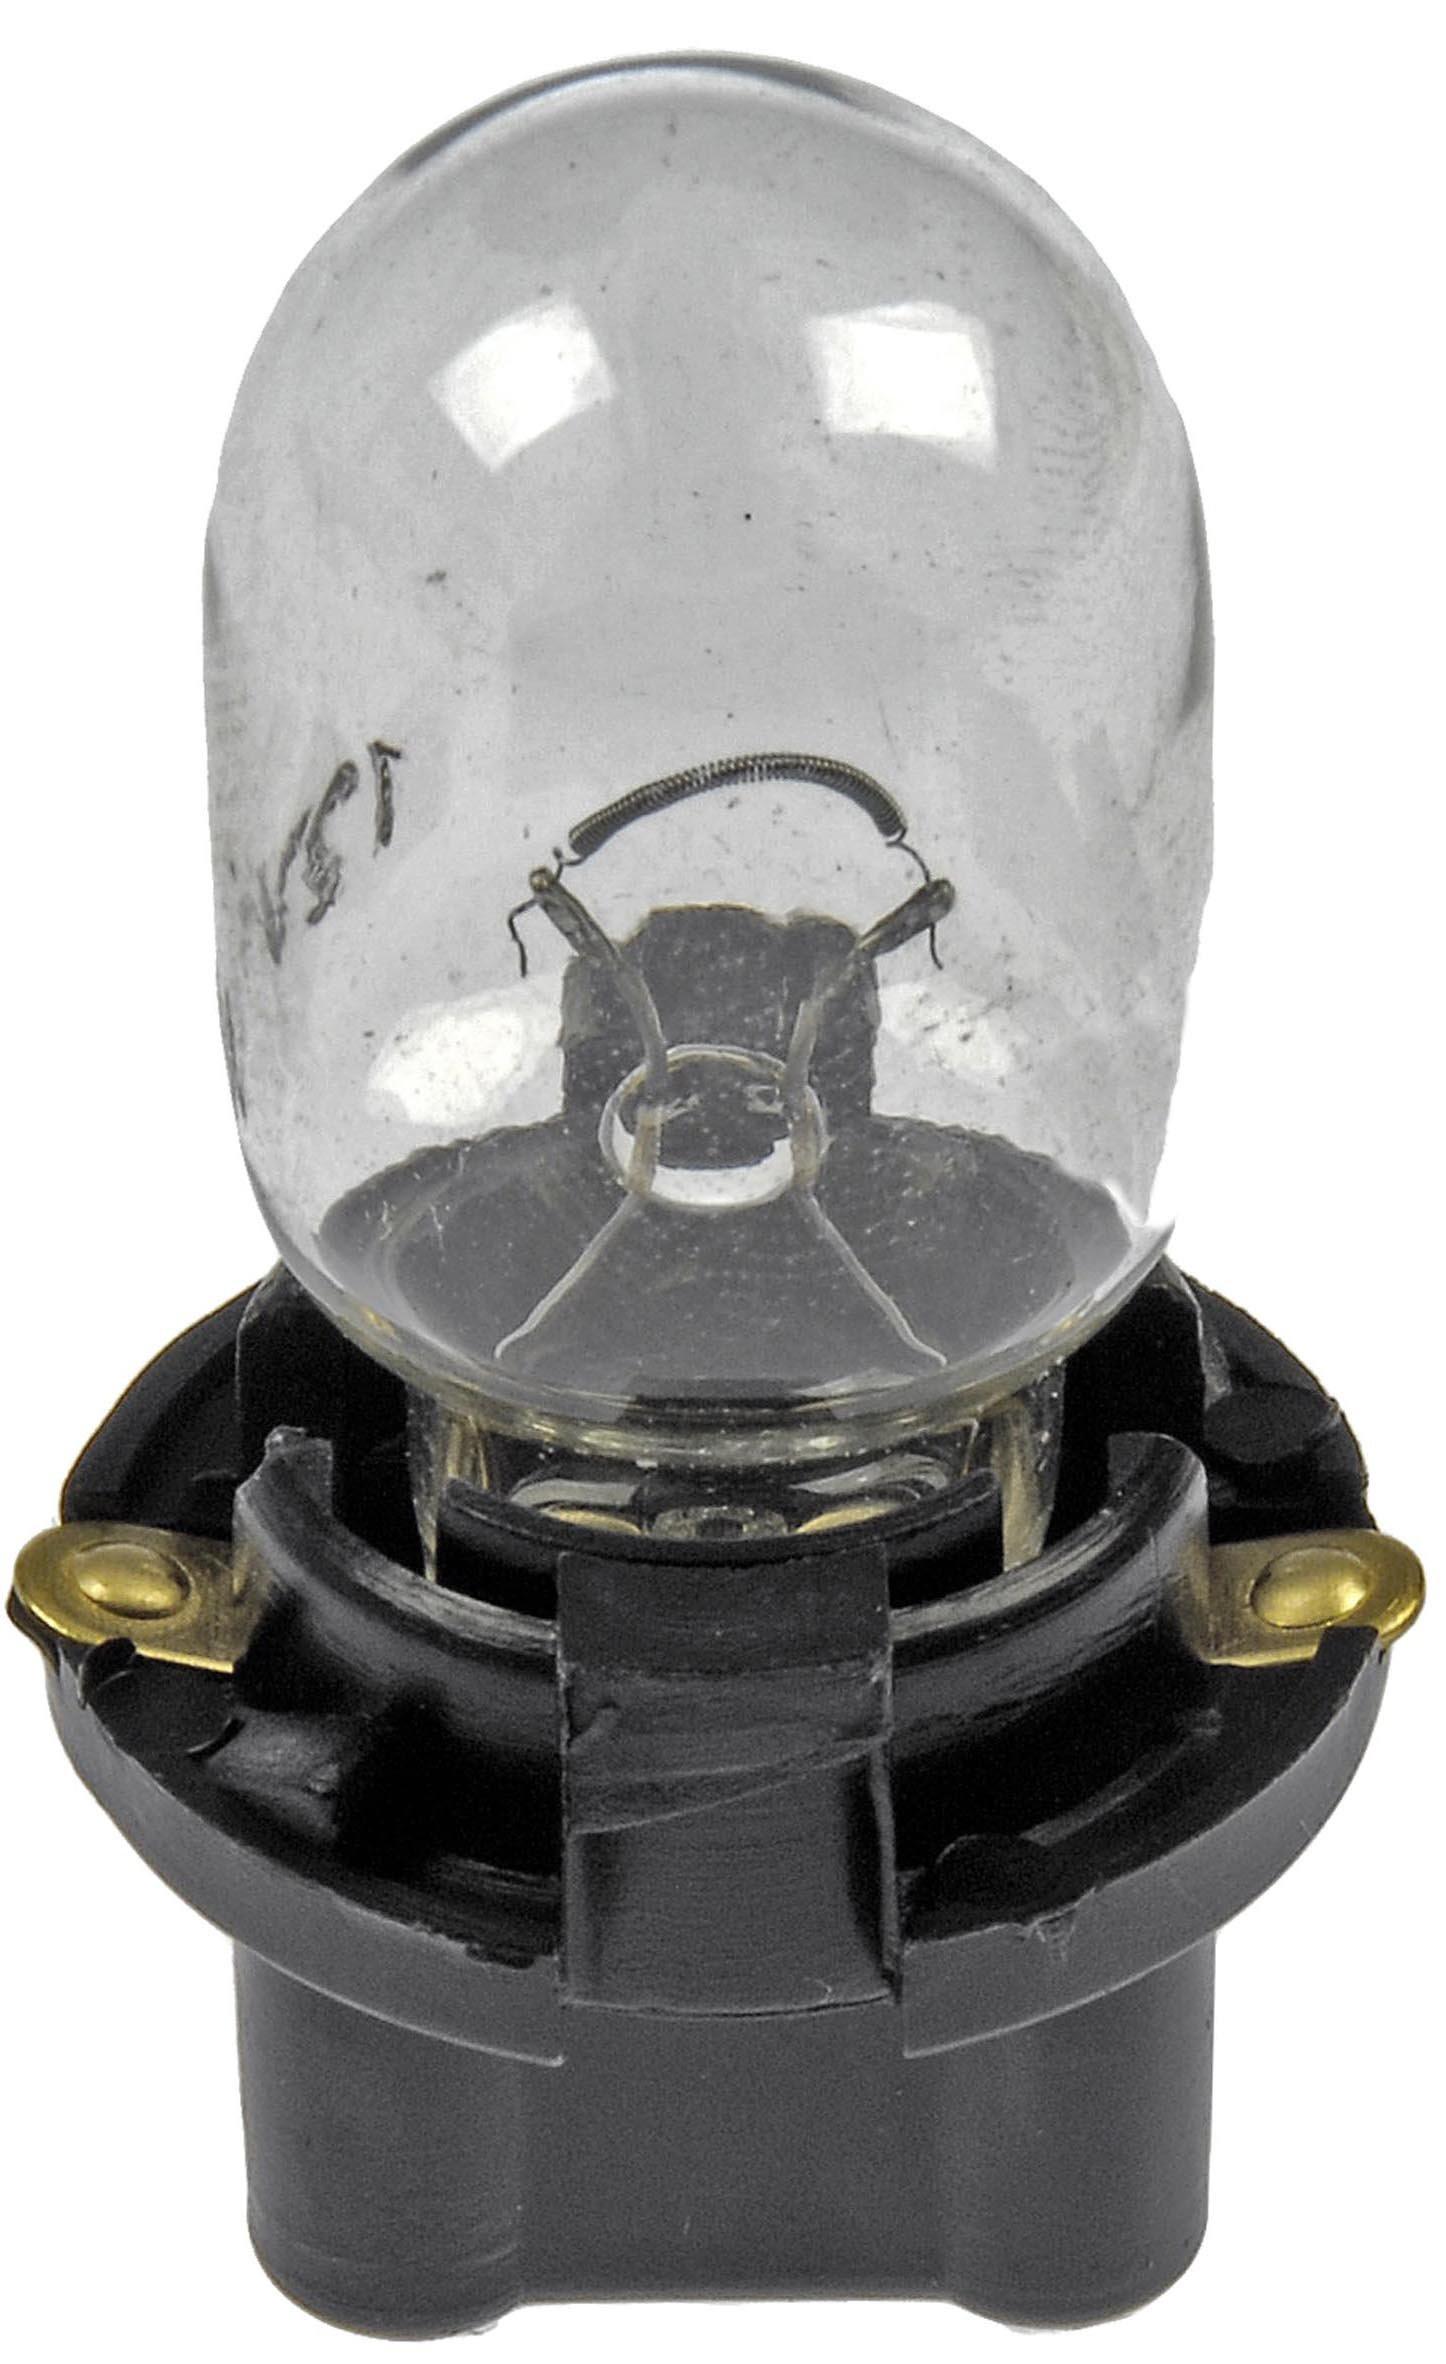 Dorman 639-011 Overhead Console Light Bulb, Pack of 5 by Dorman